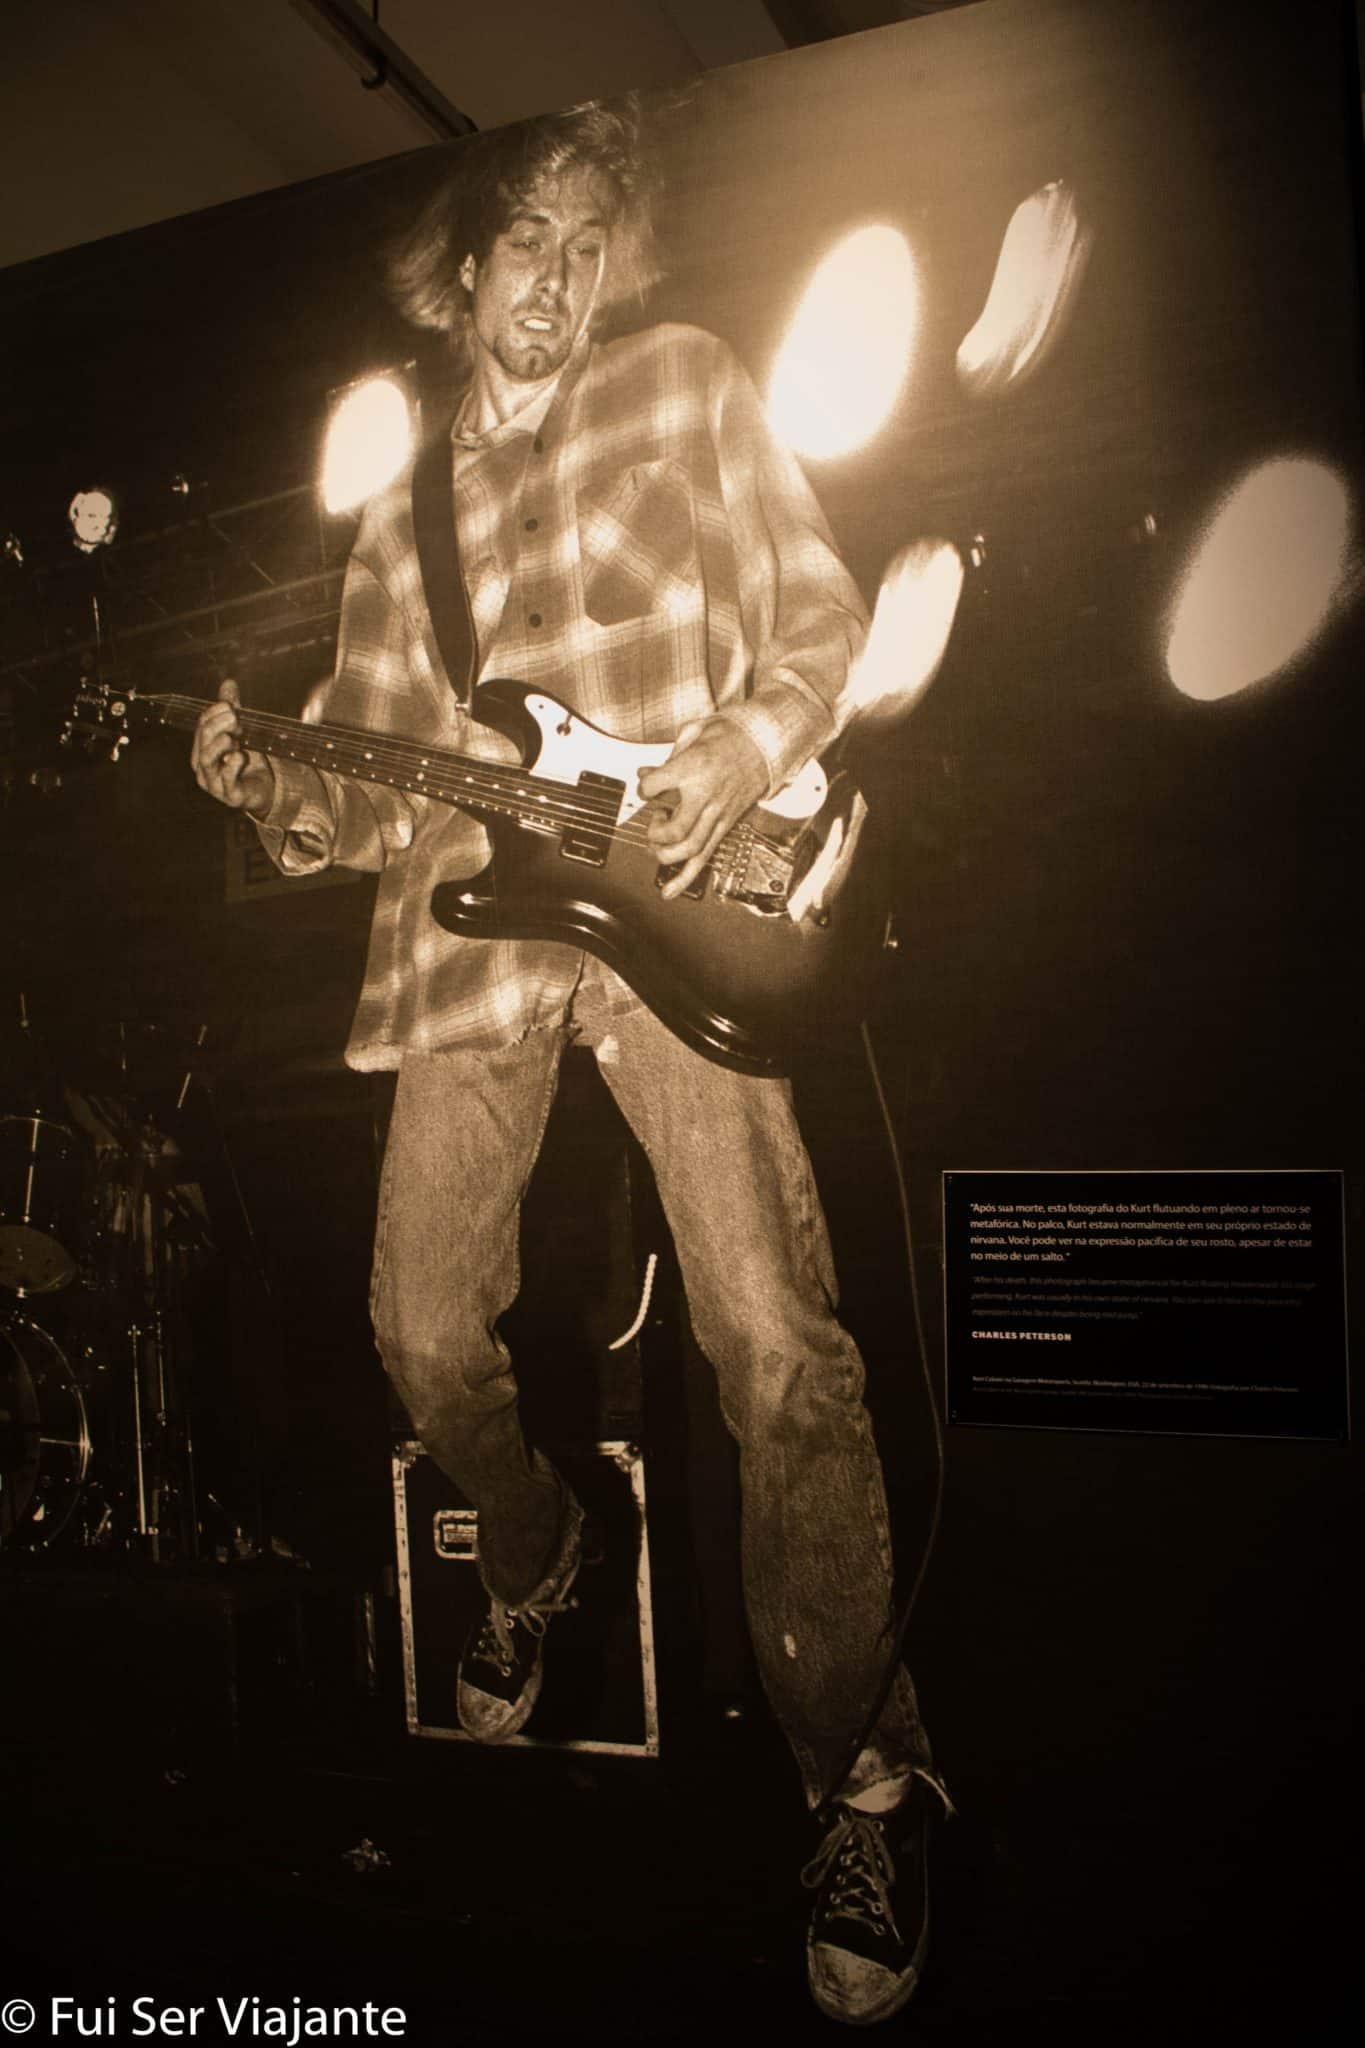 Exposição Nirvana: taking punk to the masses